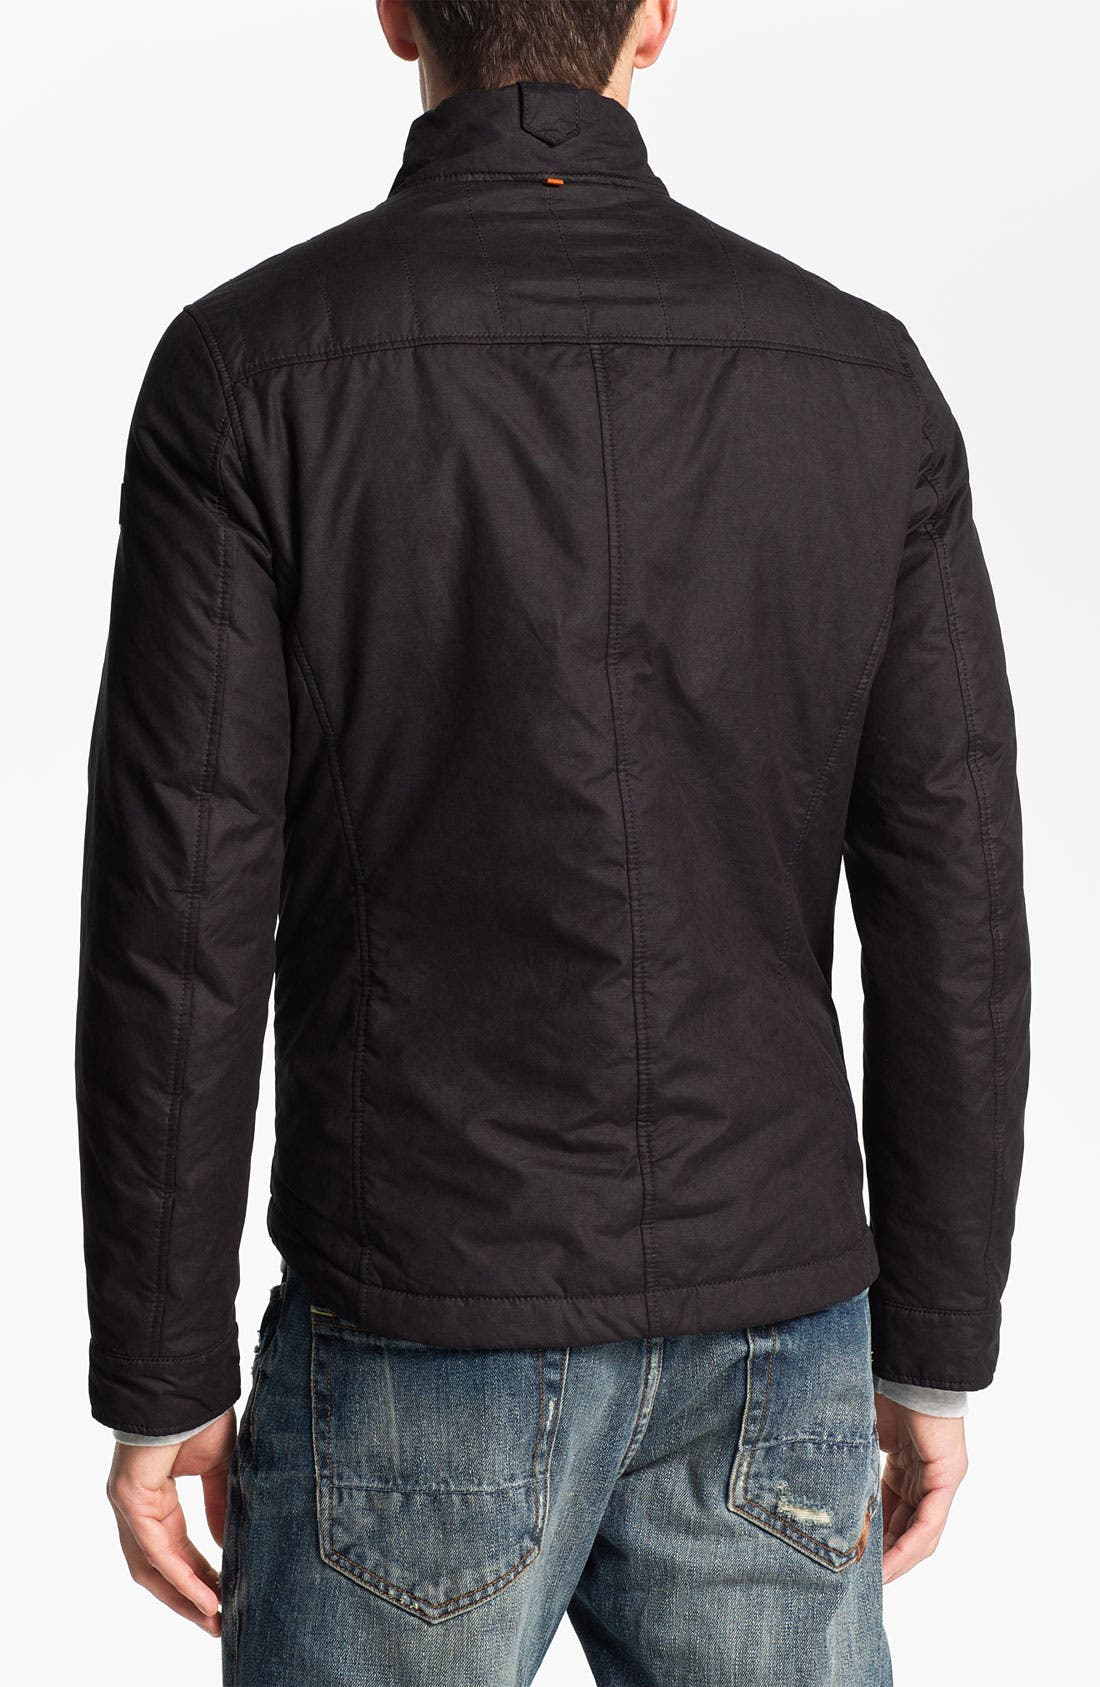 BOSS ORANGE,                             'Onso' Jacket,                             Alternate thumbnail 3, color,                             001